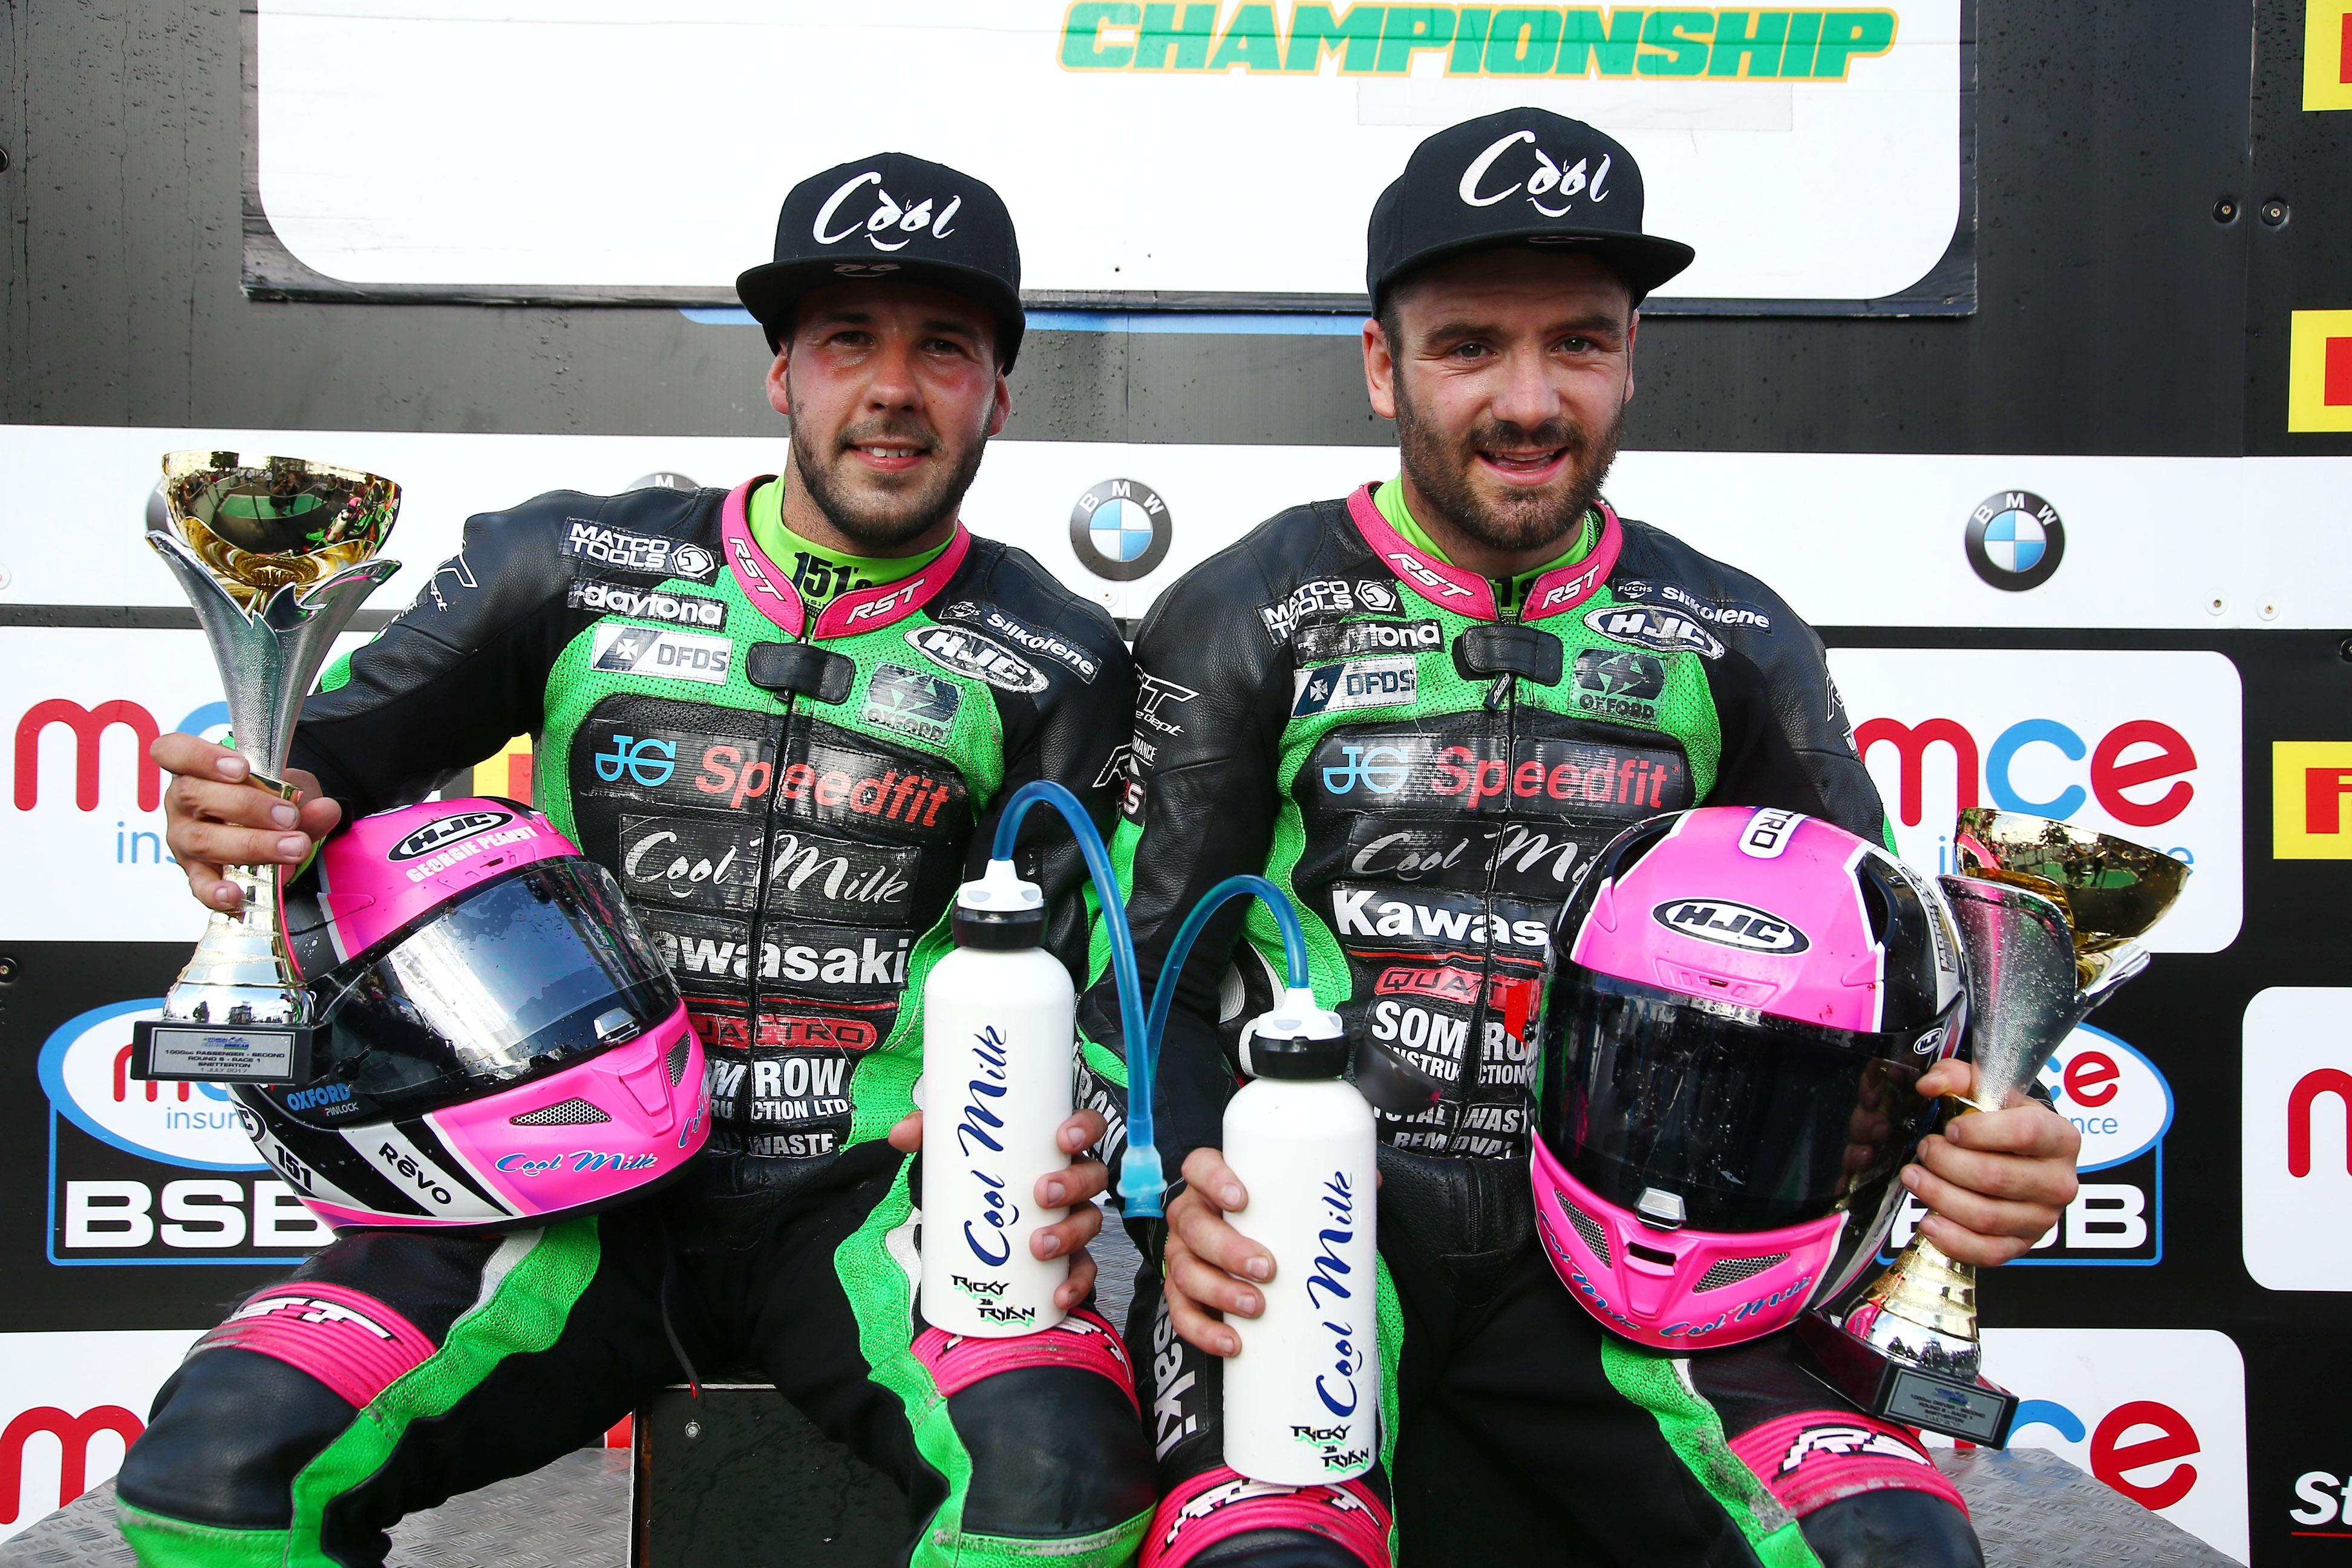 2017 British Superbike Championship, BSB R05, Snetterton, Norfolk, UK. 1st July 2017. Ricky Stevens & Ryan Charlwood, JG Speedfit Cool Kawasaki, LCR Kawasaki